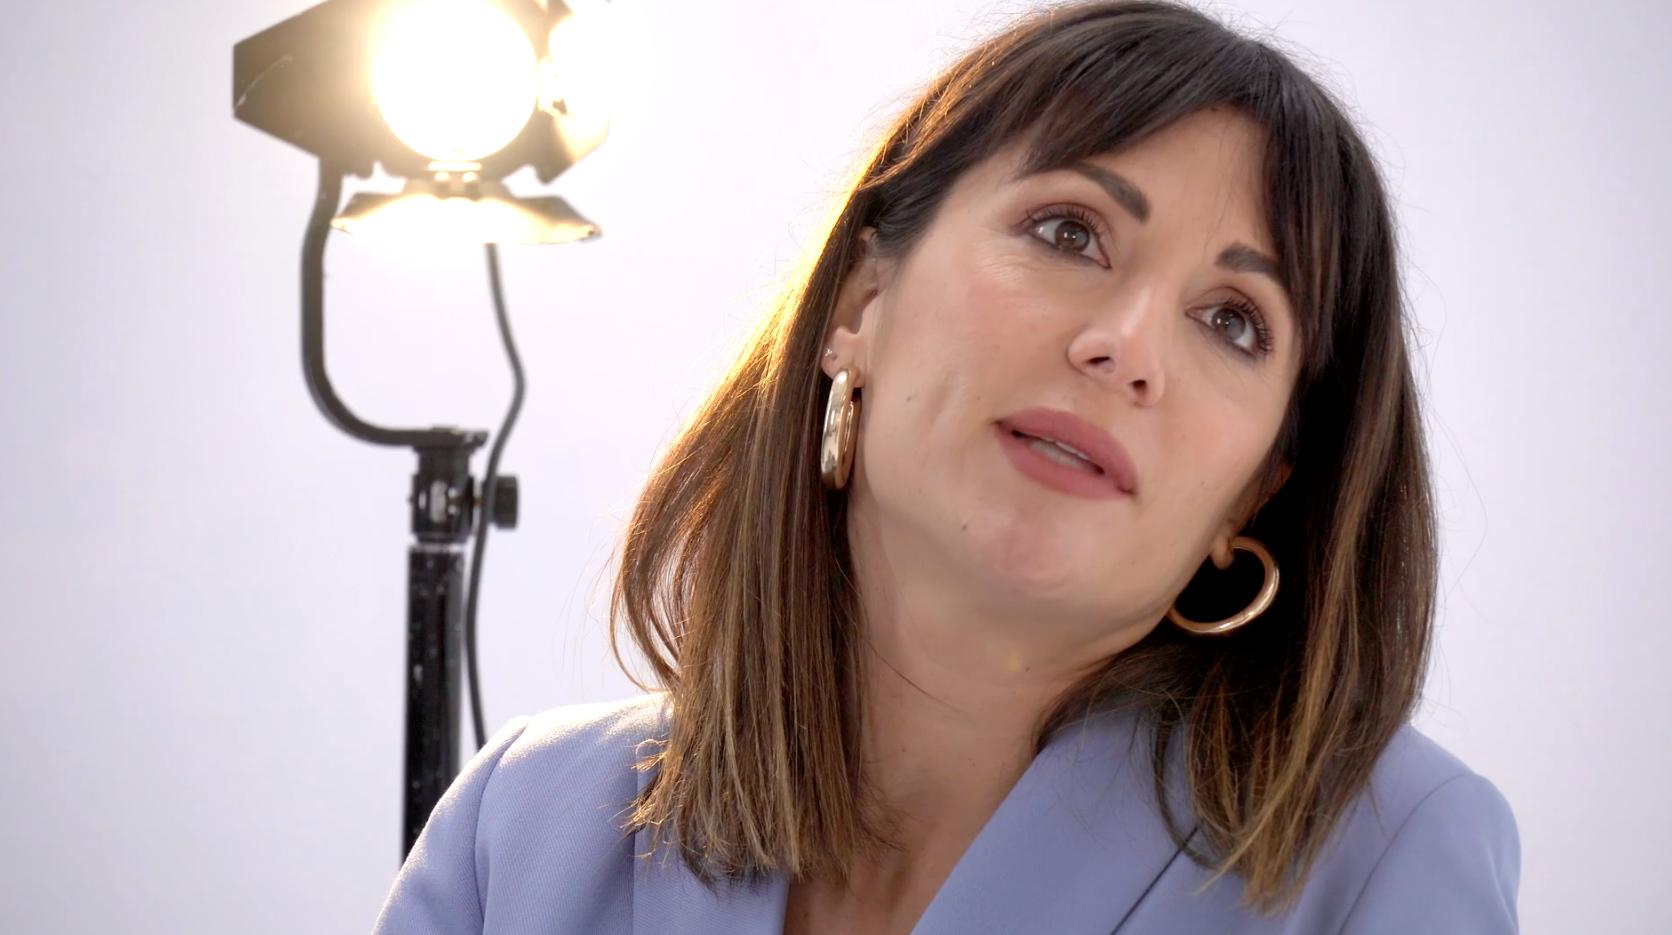 Nagore Robles parla de salut mental - Youtube